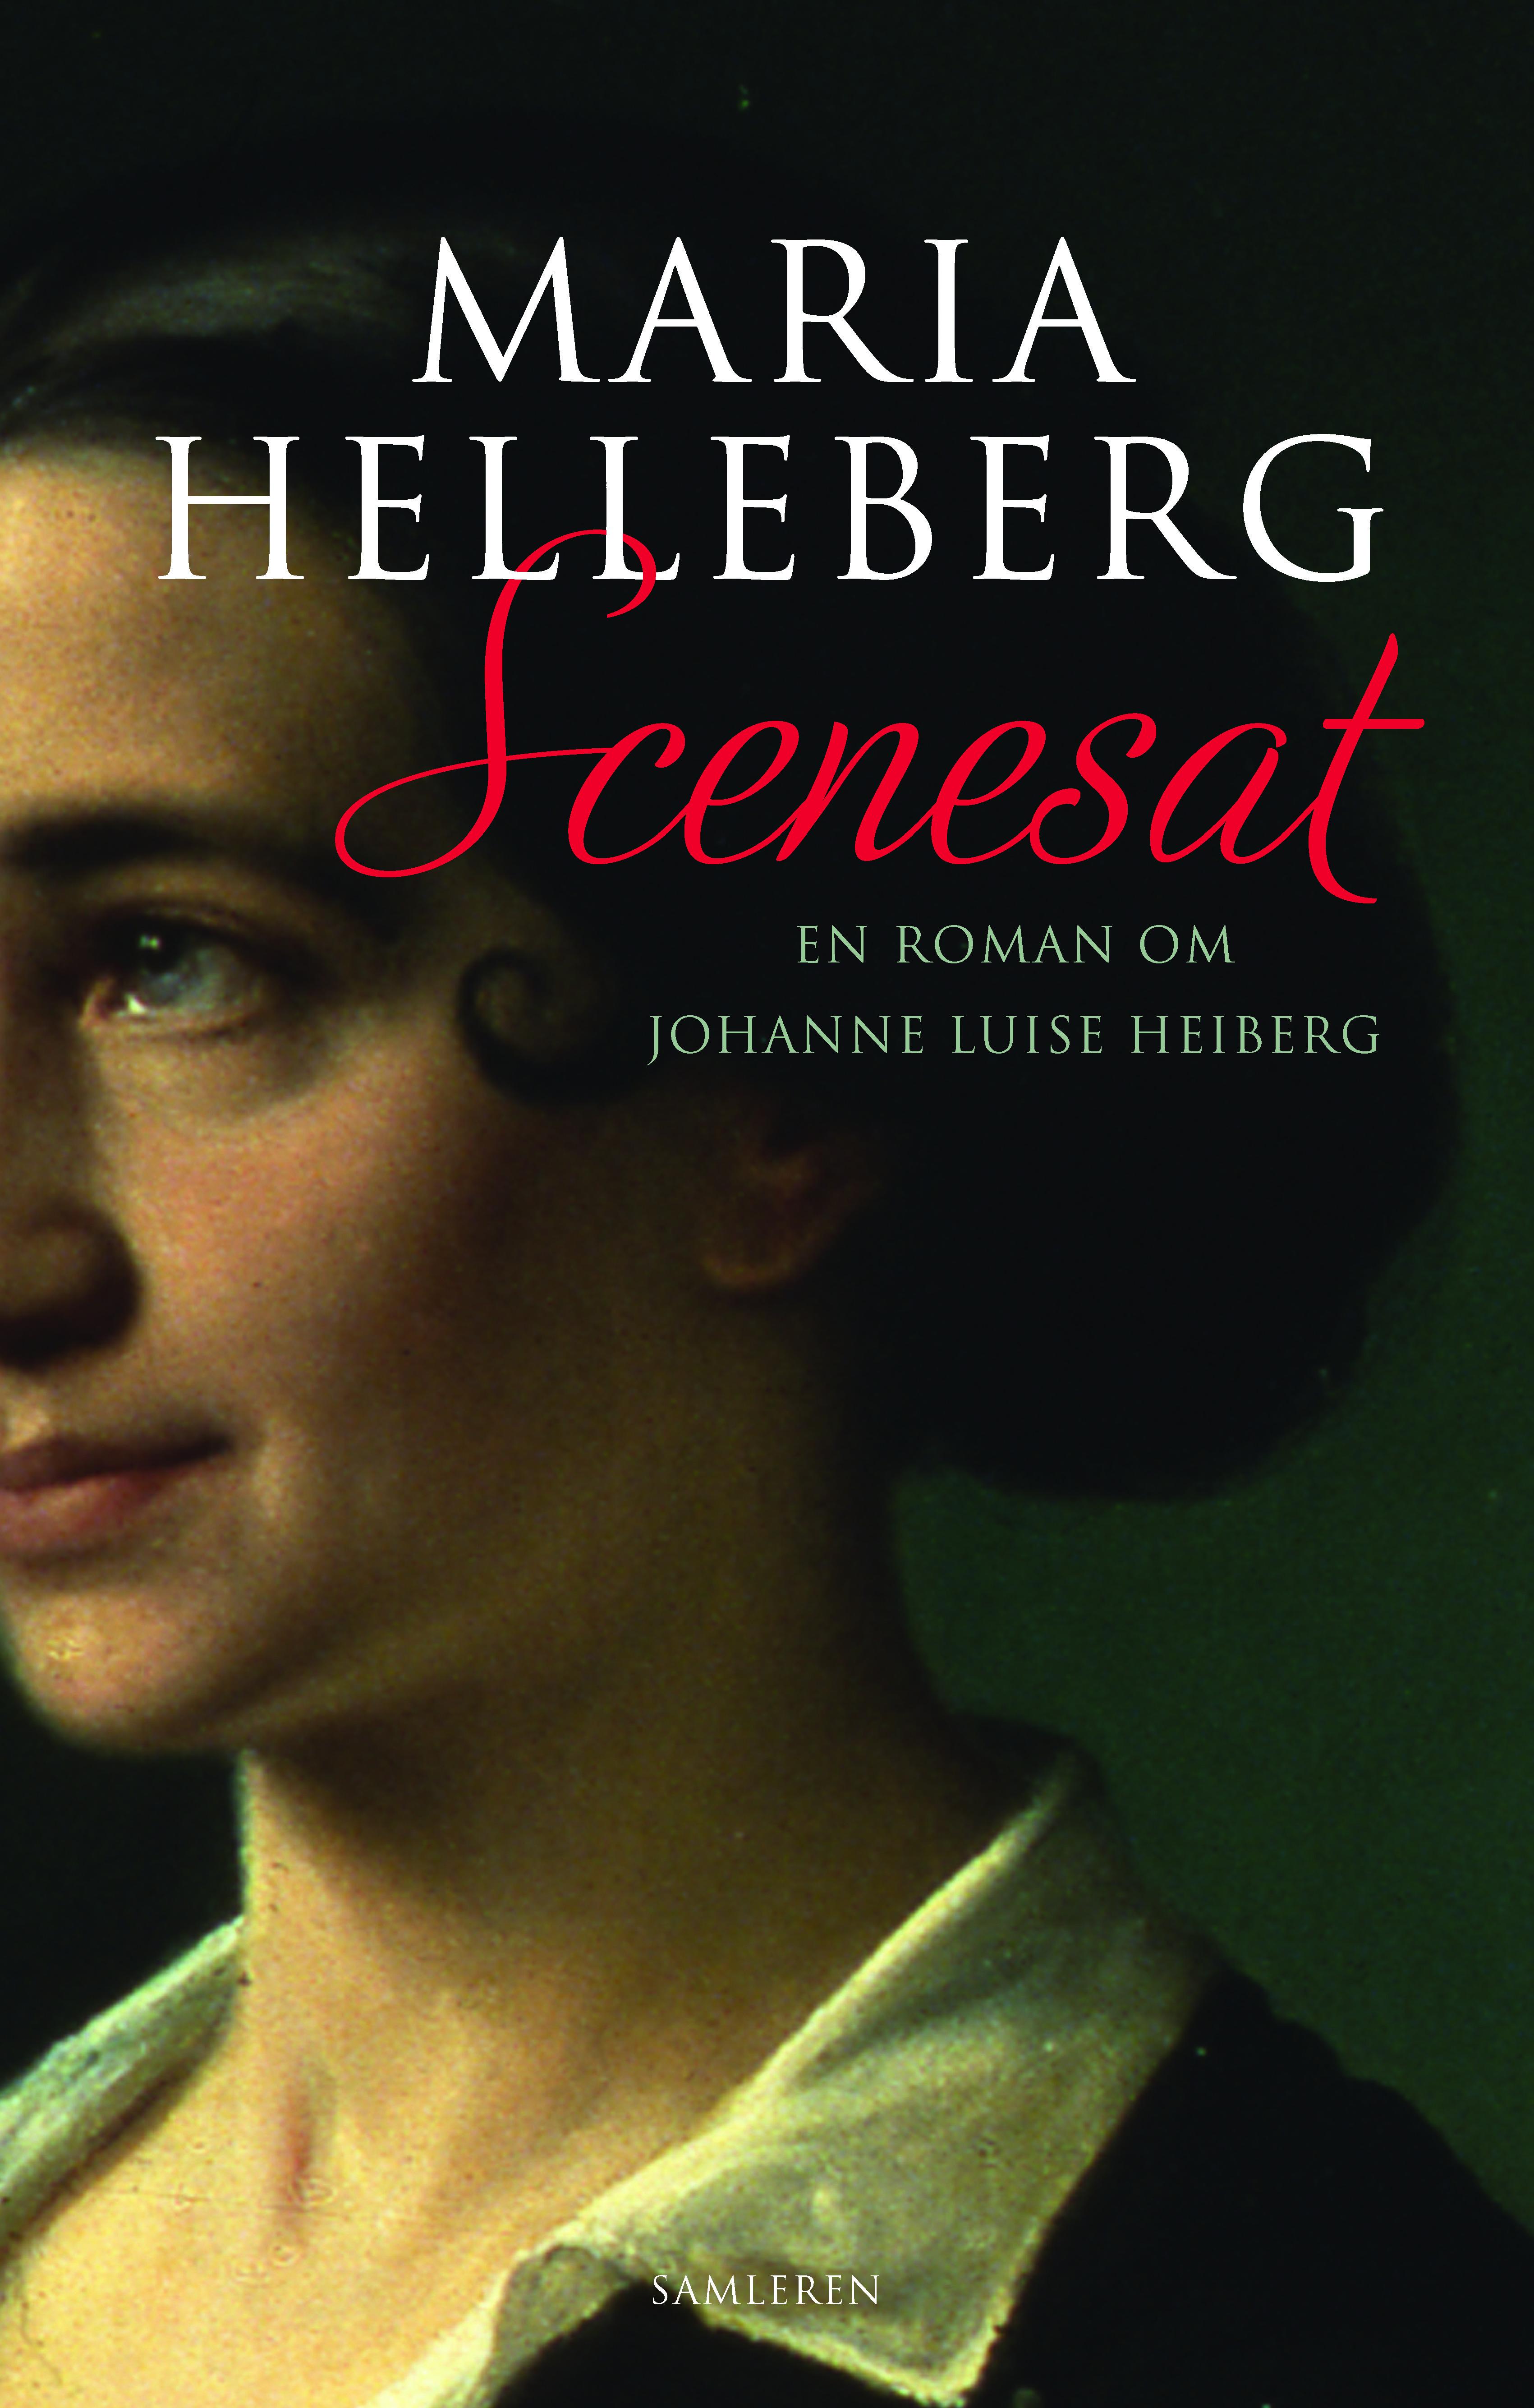 Helleberg,Scenesat_final